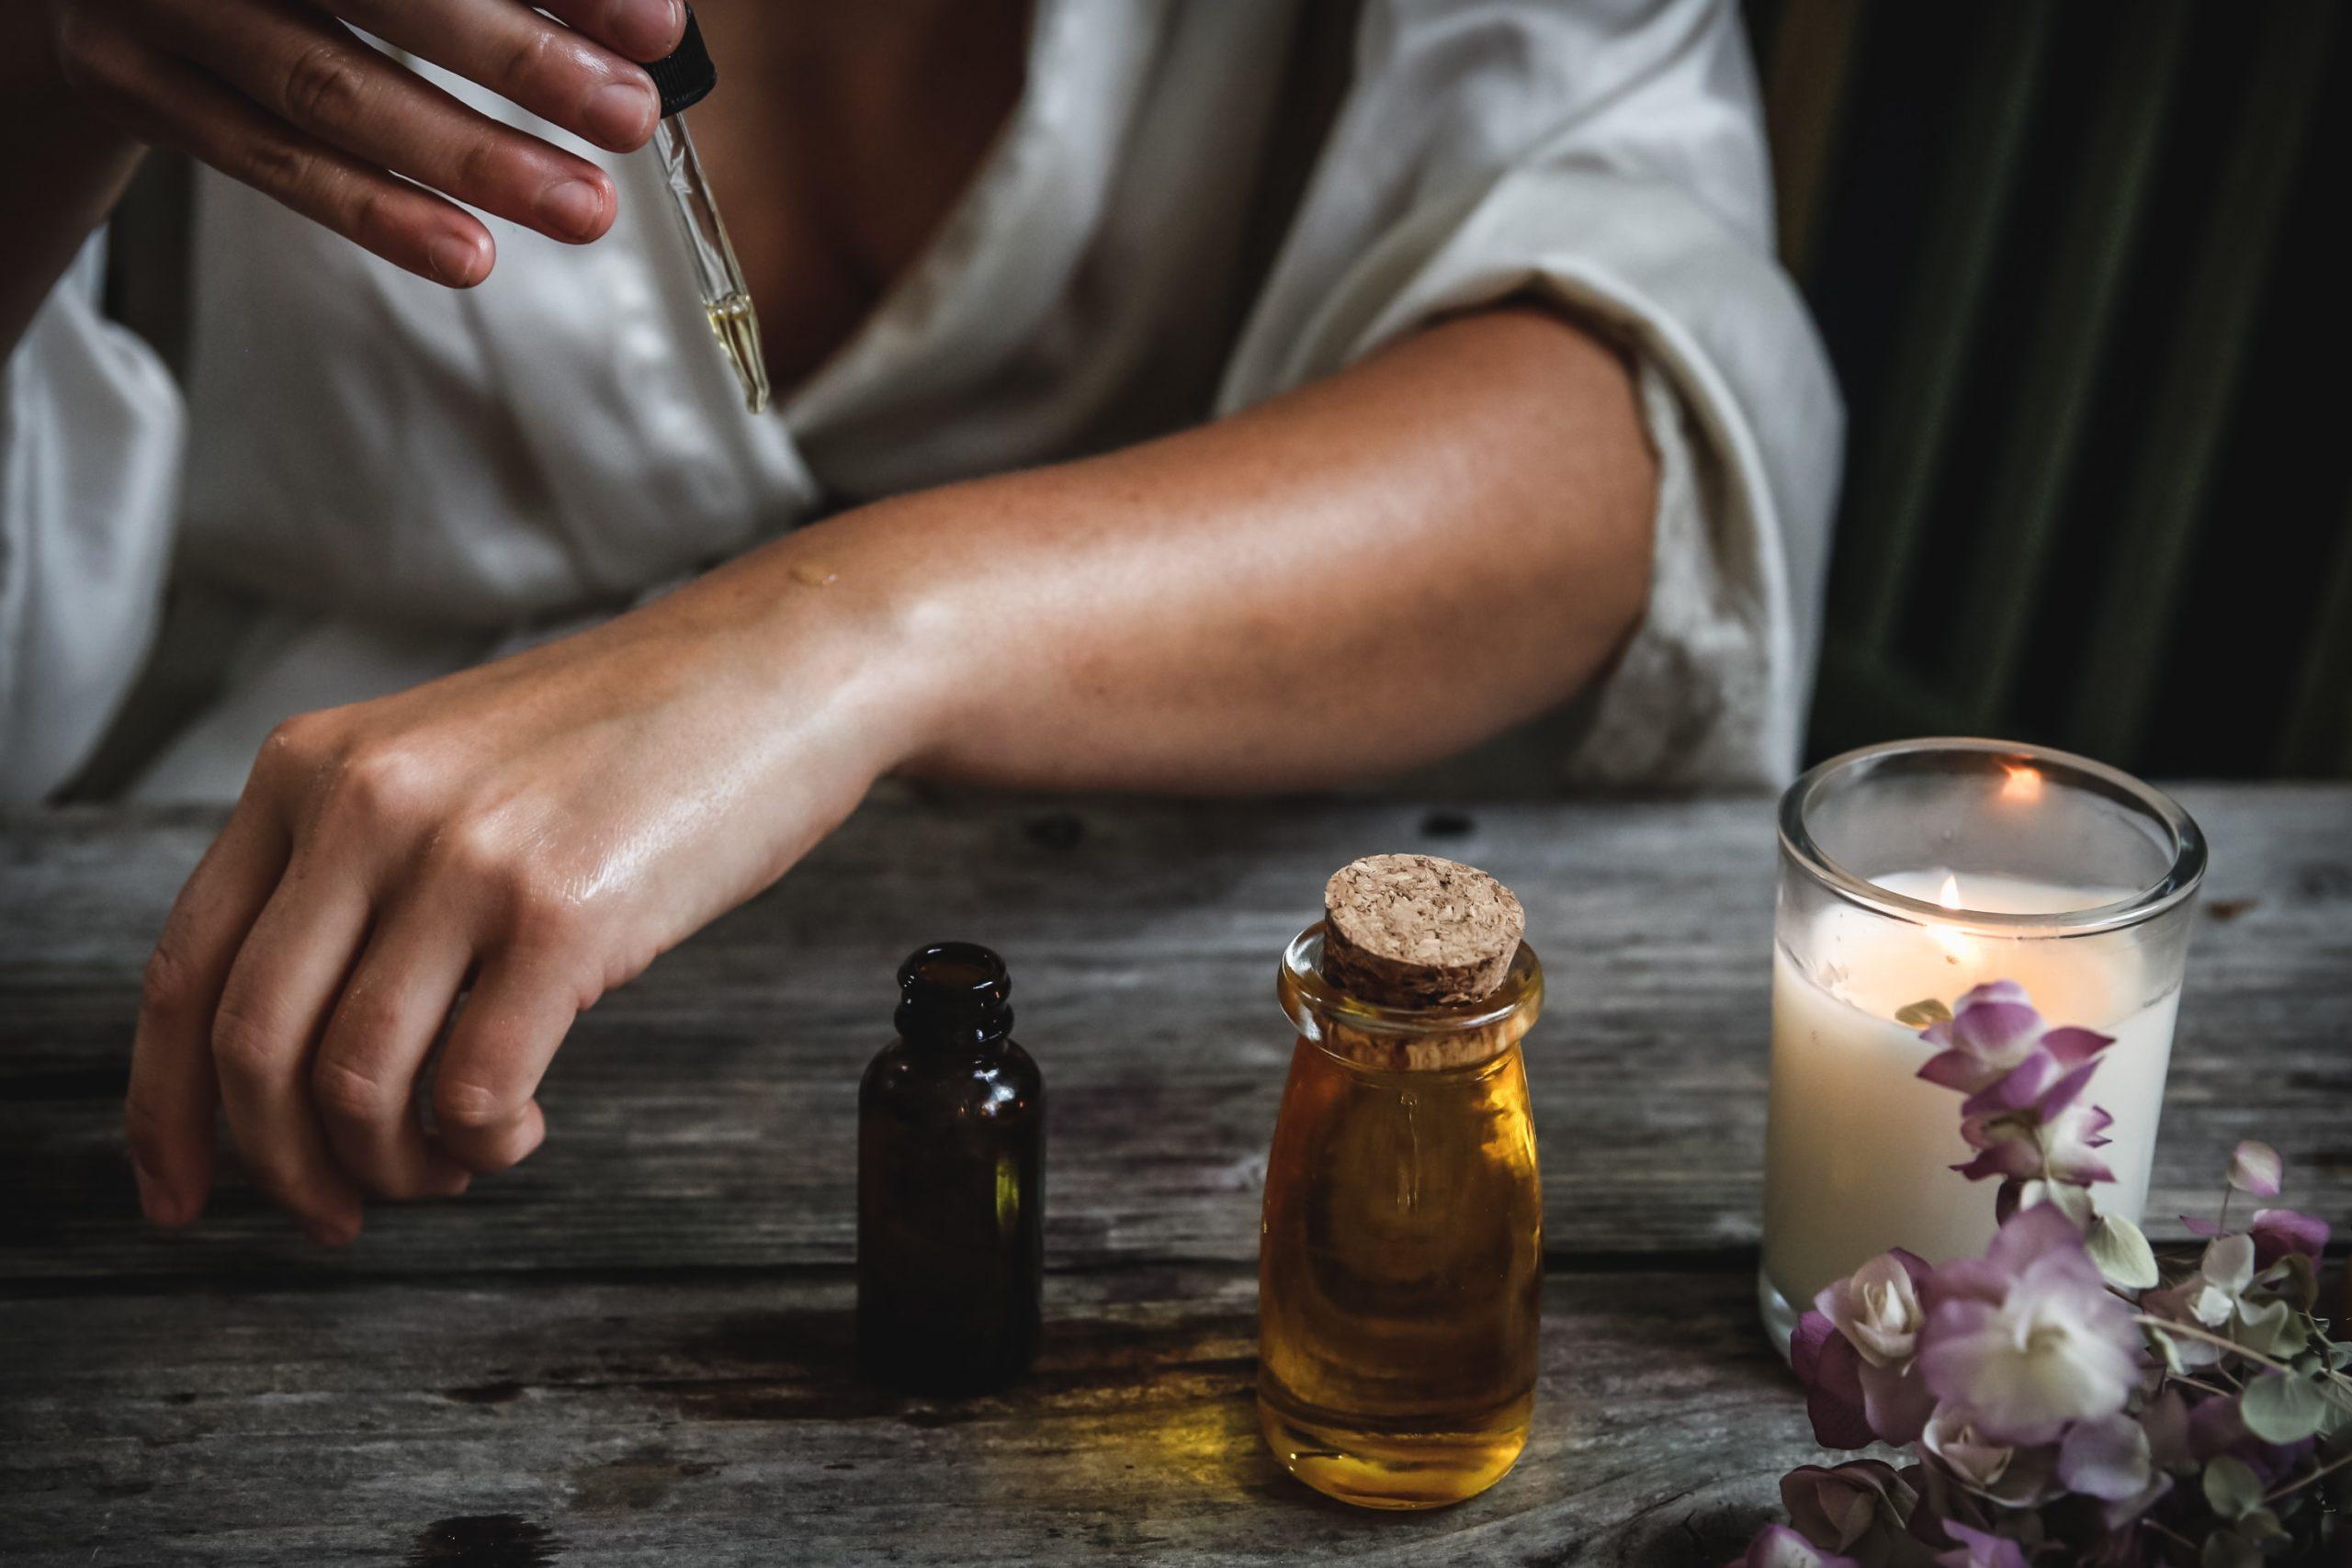 uso terapéutico cannabis therapeutic use marihuana marijuana study